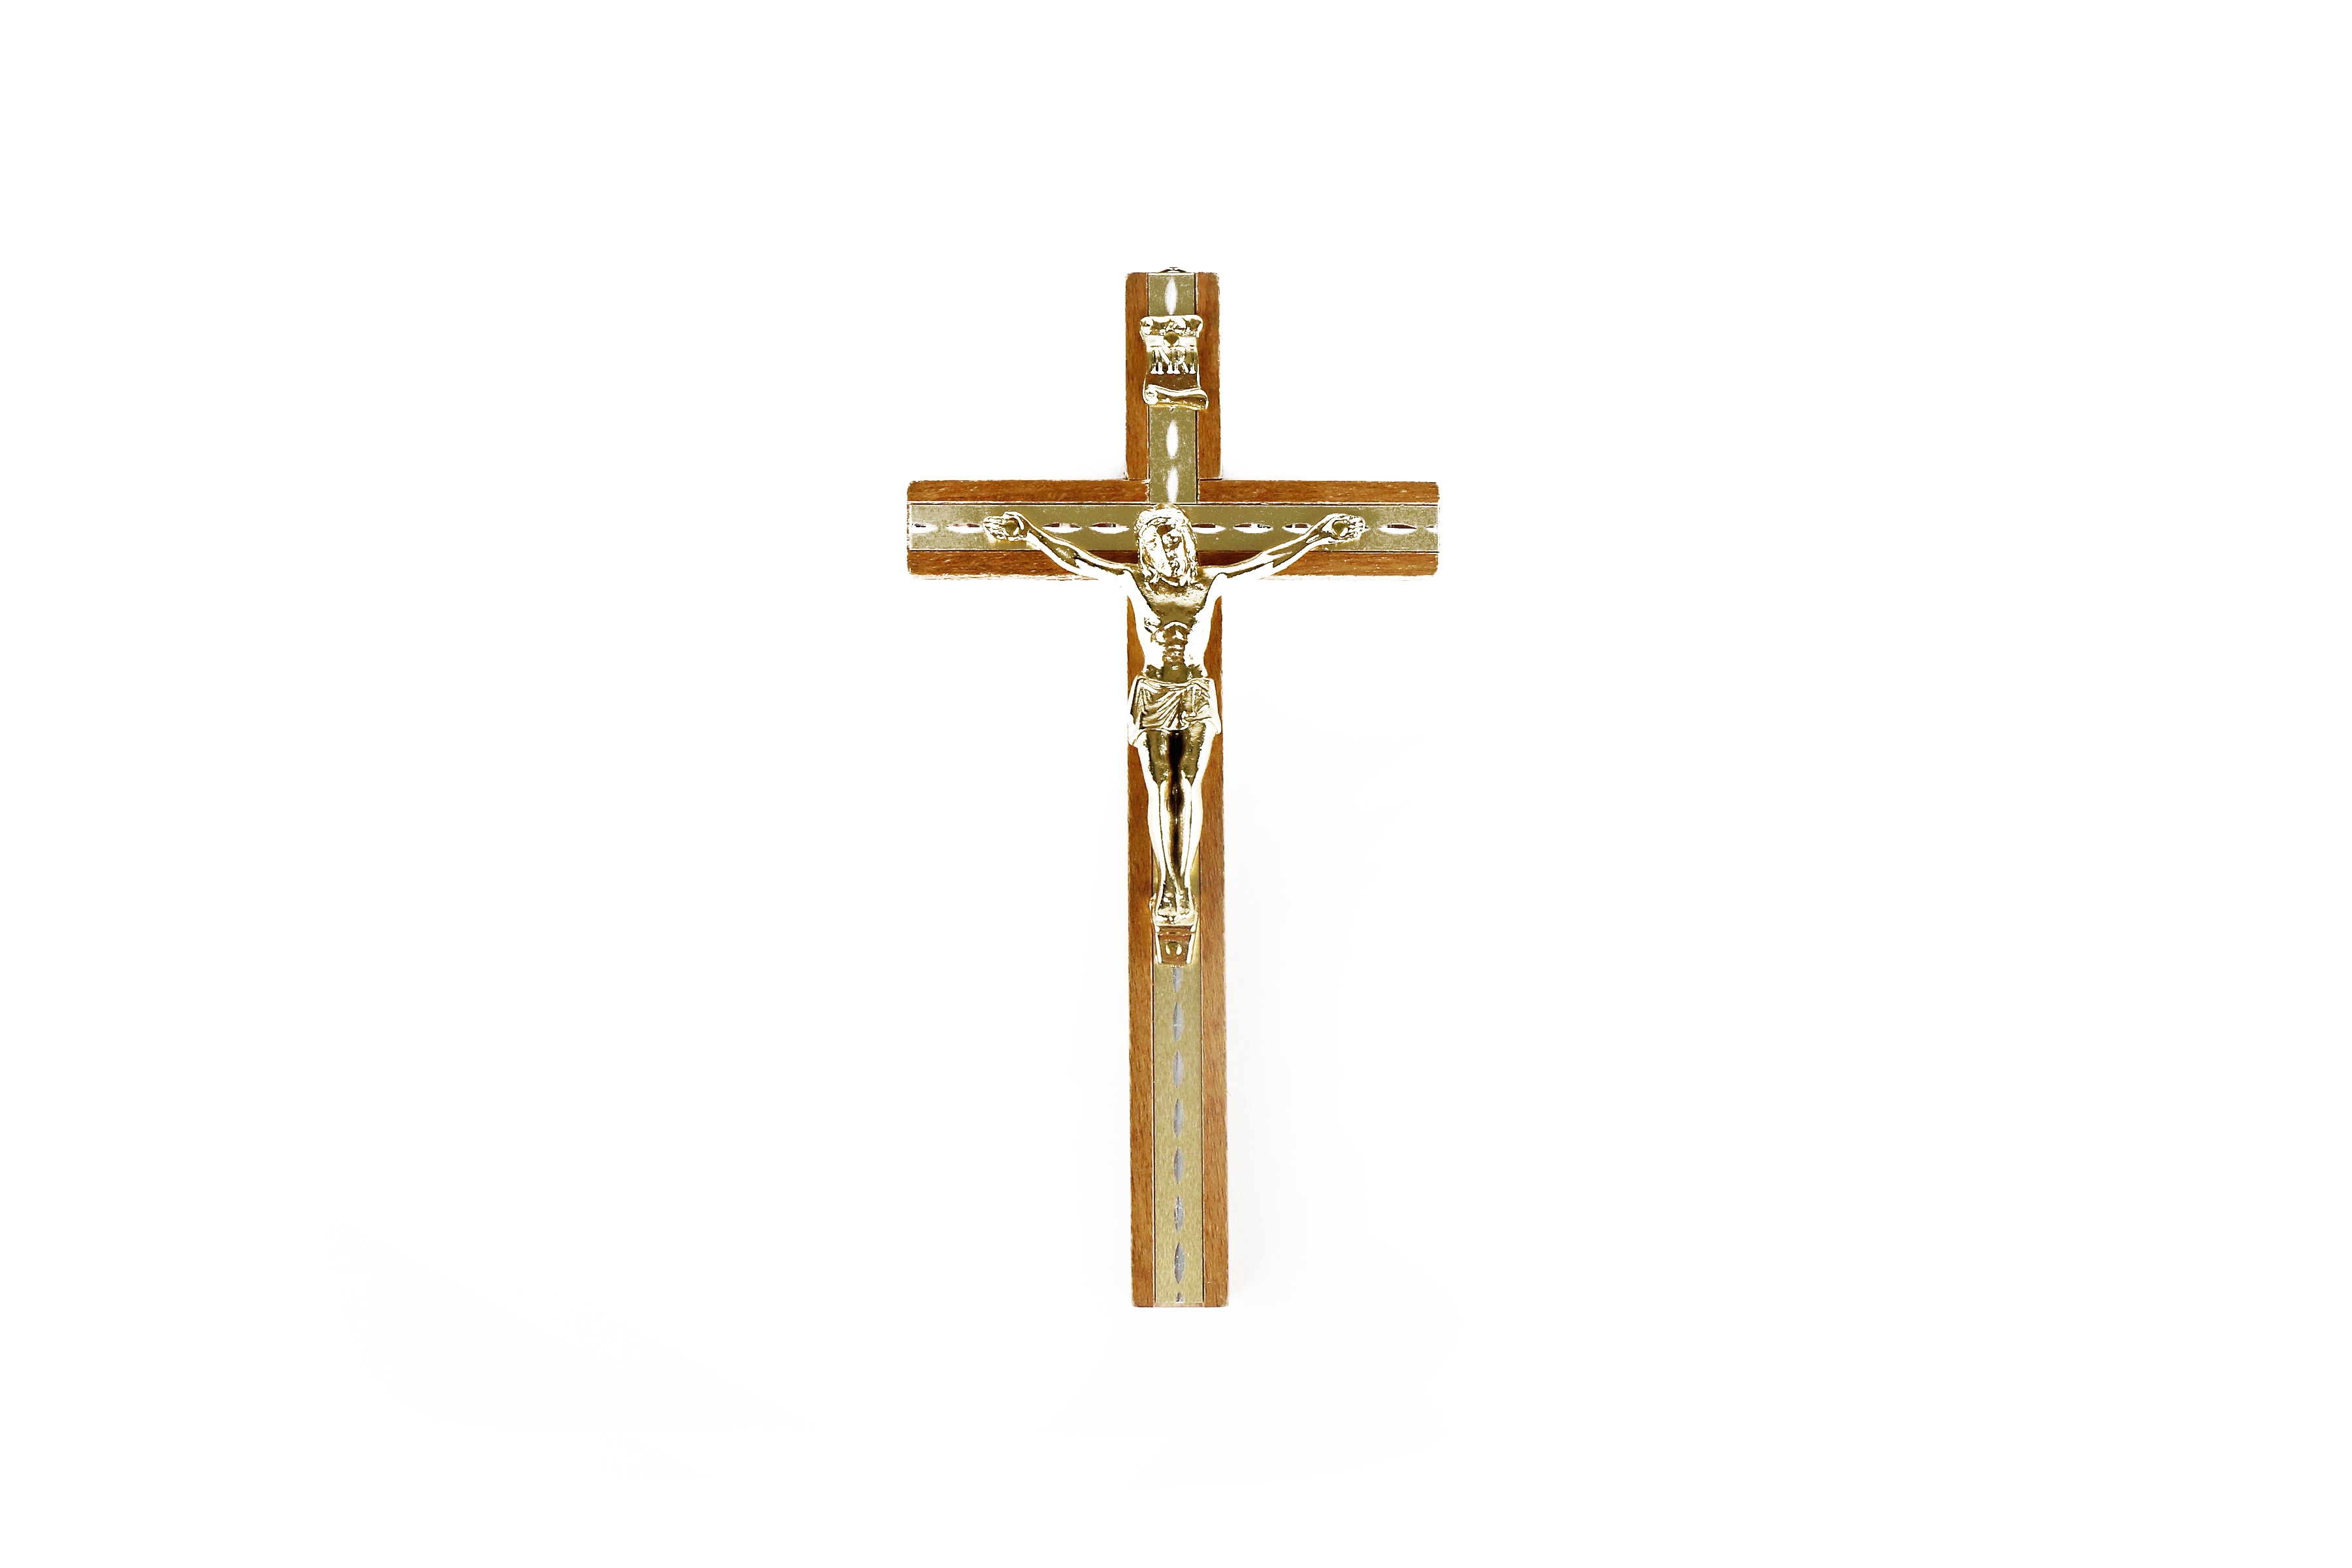 Crucifix en bois et métal avec corpus doré / Wooden wall crucifix with golden corpus